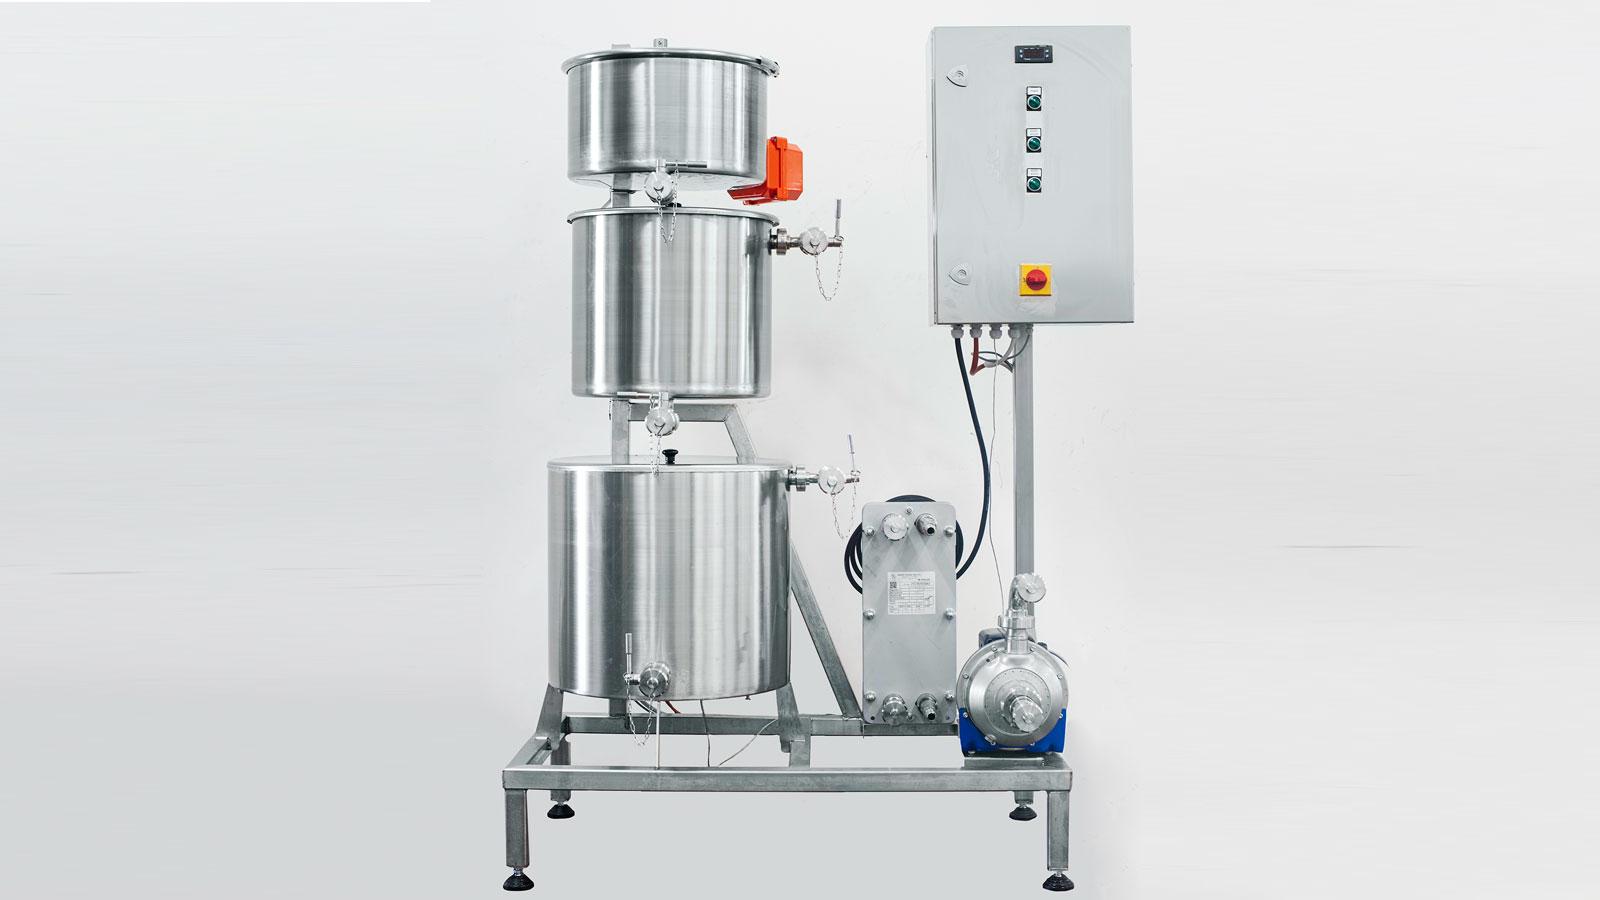 Impianto Birra TIX-E 23 Toscana Inox